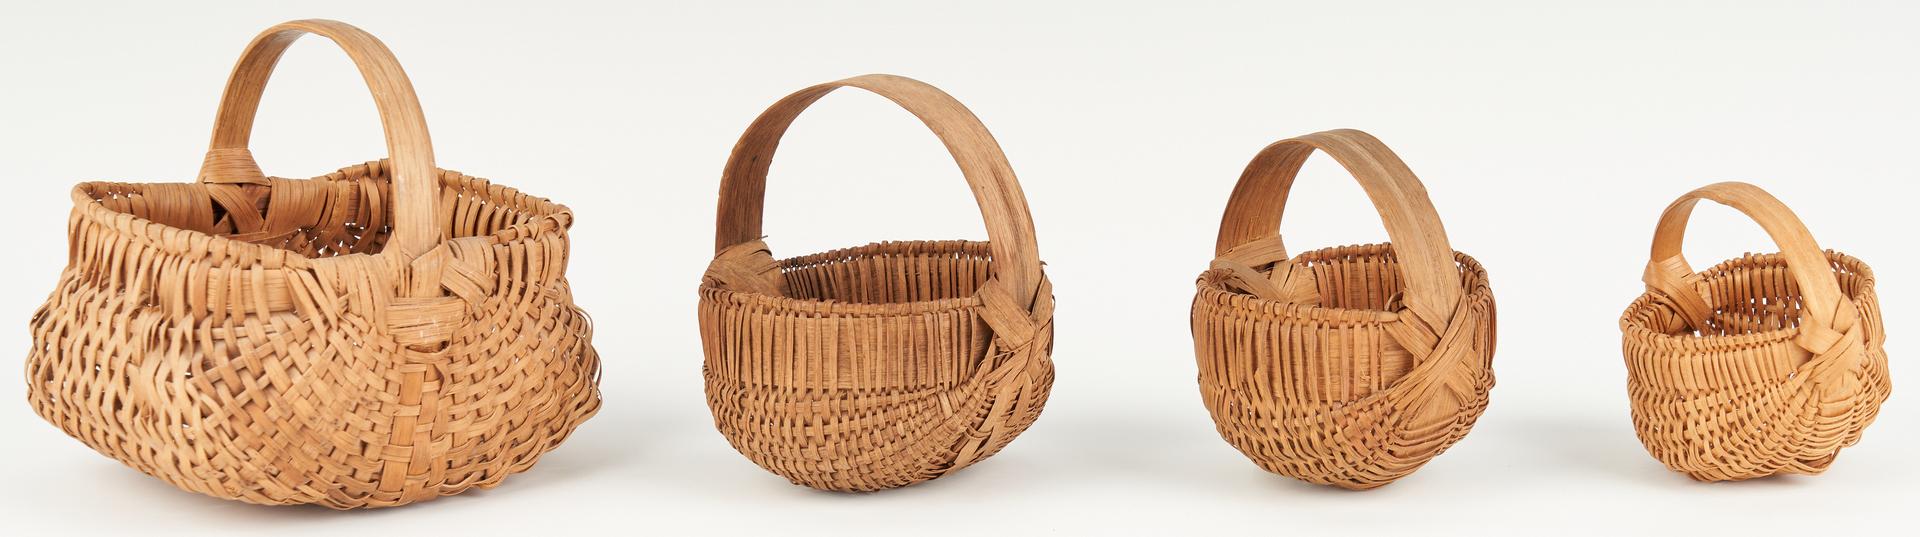 Lot 1056: 12 American Miniature Baskets, Prob. Southern